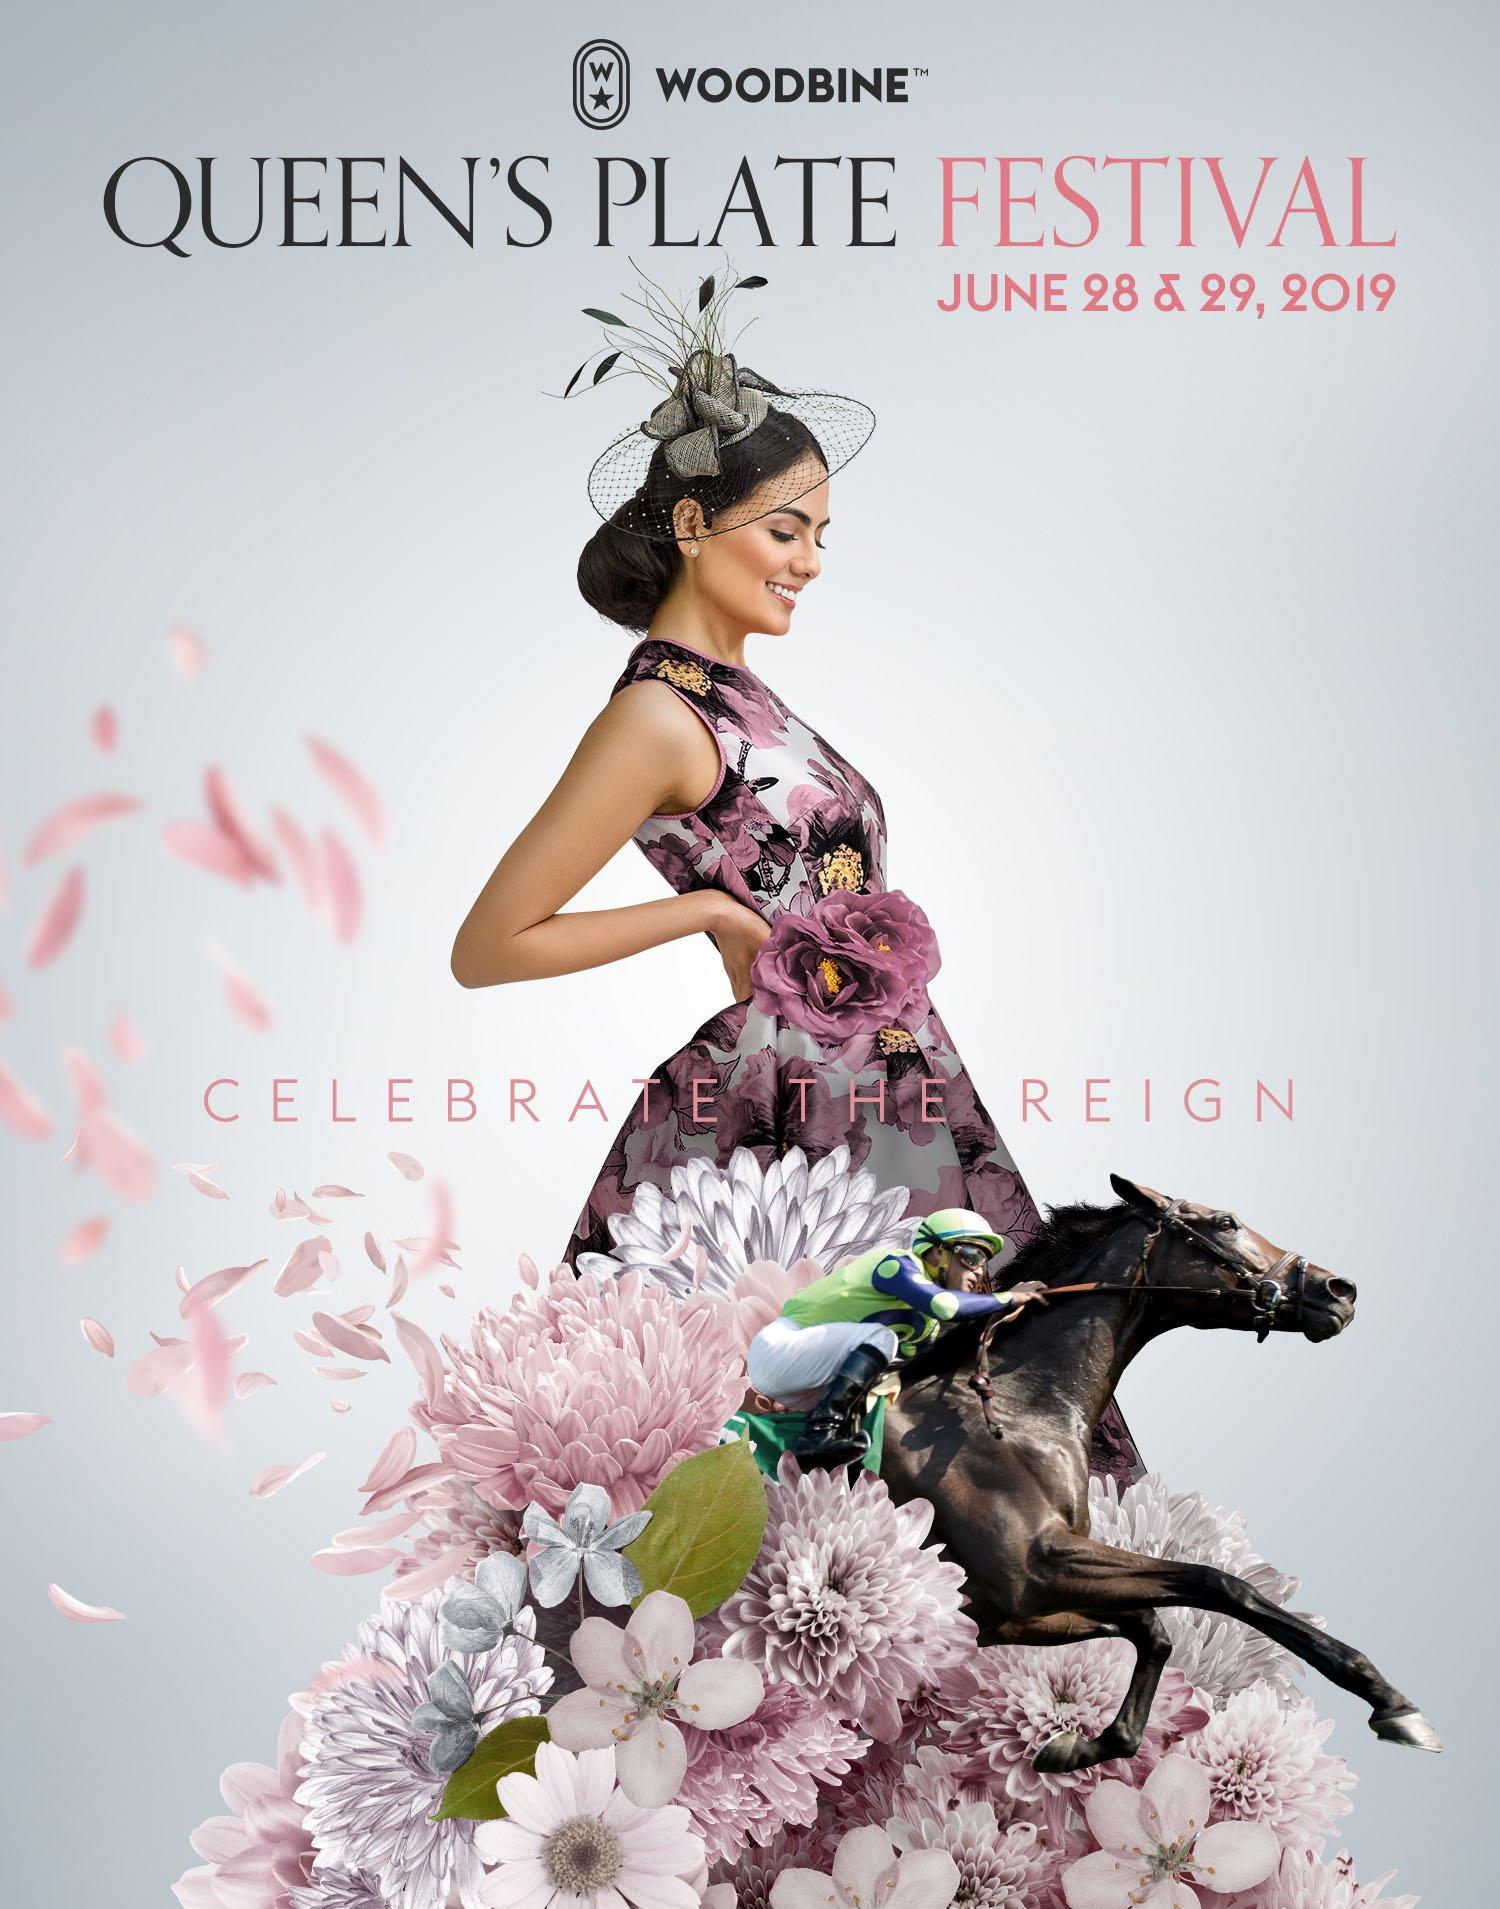 Queen's-plate-2019-shayne-gray-woodbine-entertainment.jpg